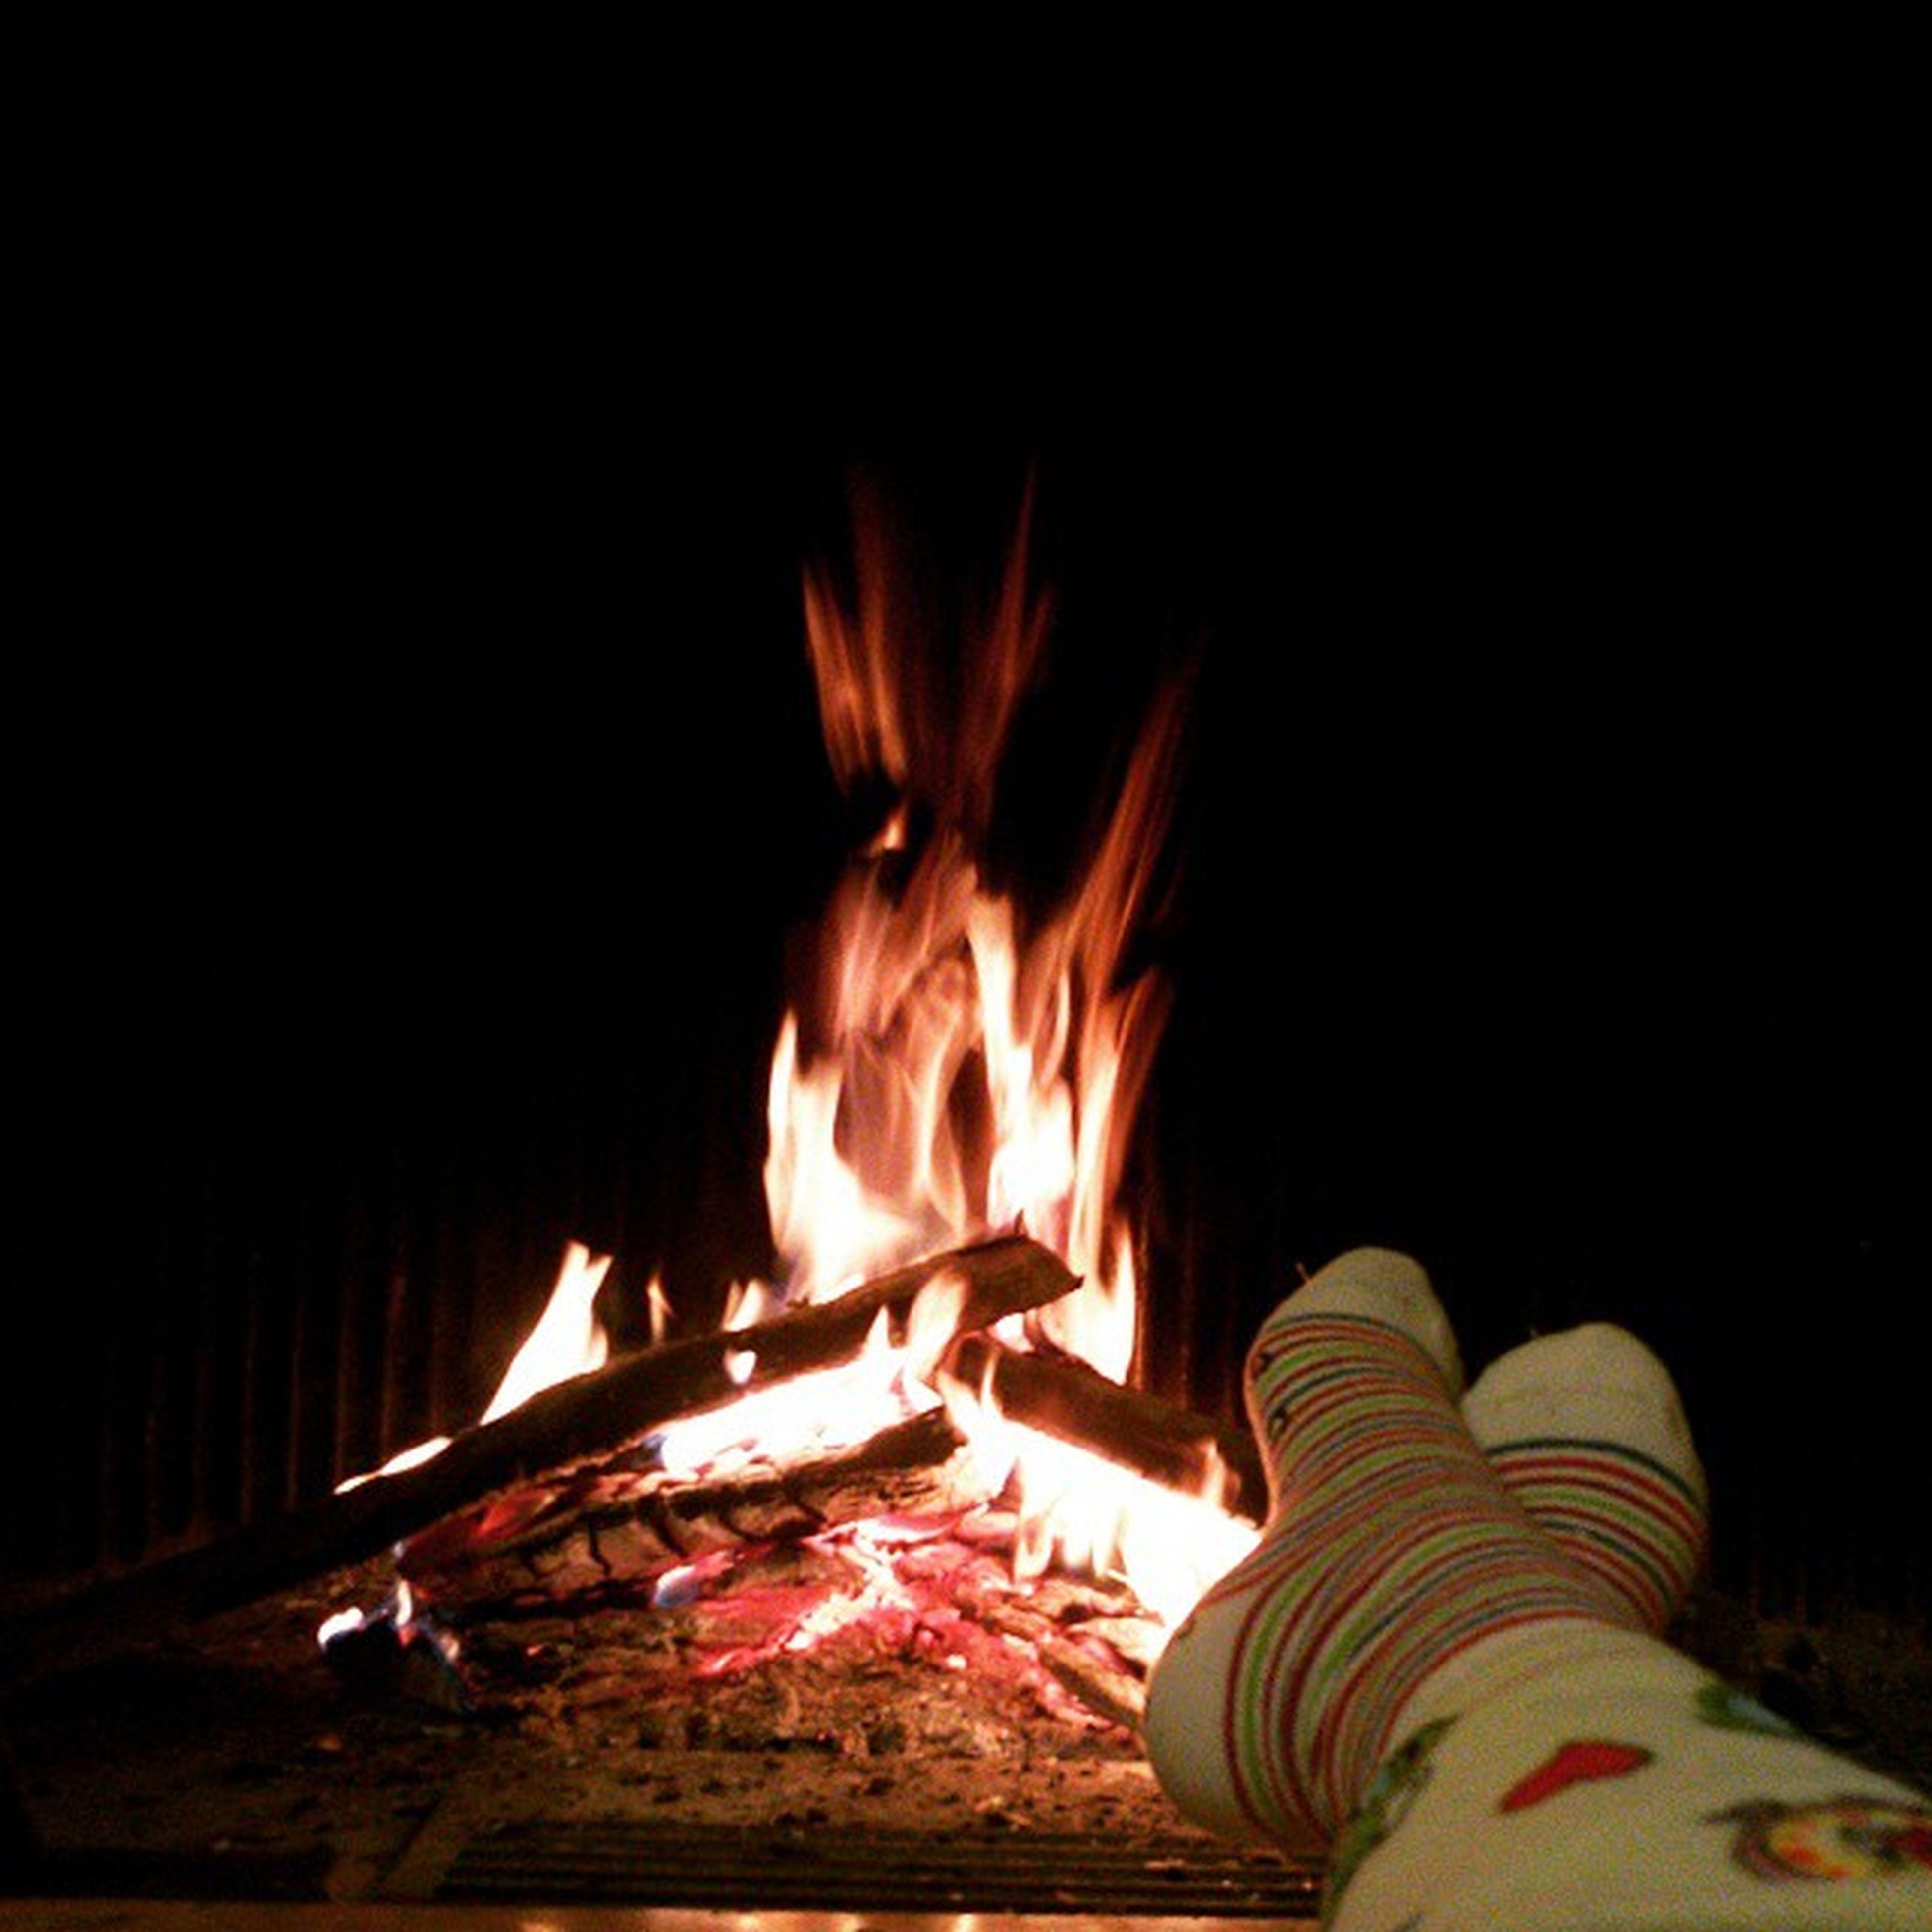 burning, flame, fire - natural phenomenon, heat - temperature, night, glowing, fire, illuminated, bonfire, indoors, dark, copy space, heat, campfire, firewood, motion, light - natural phenomenon, sitting